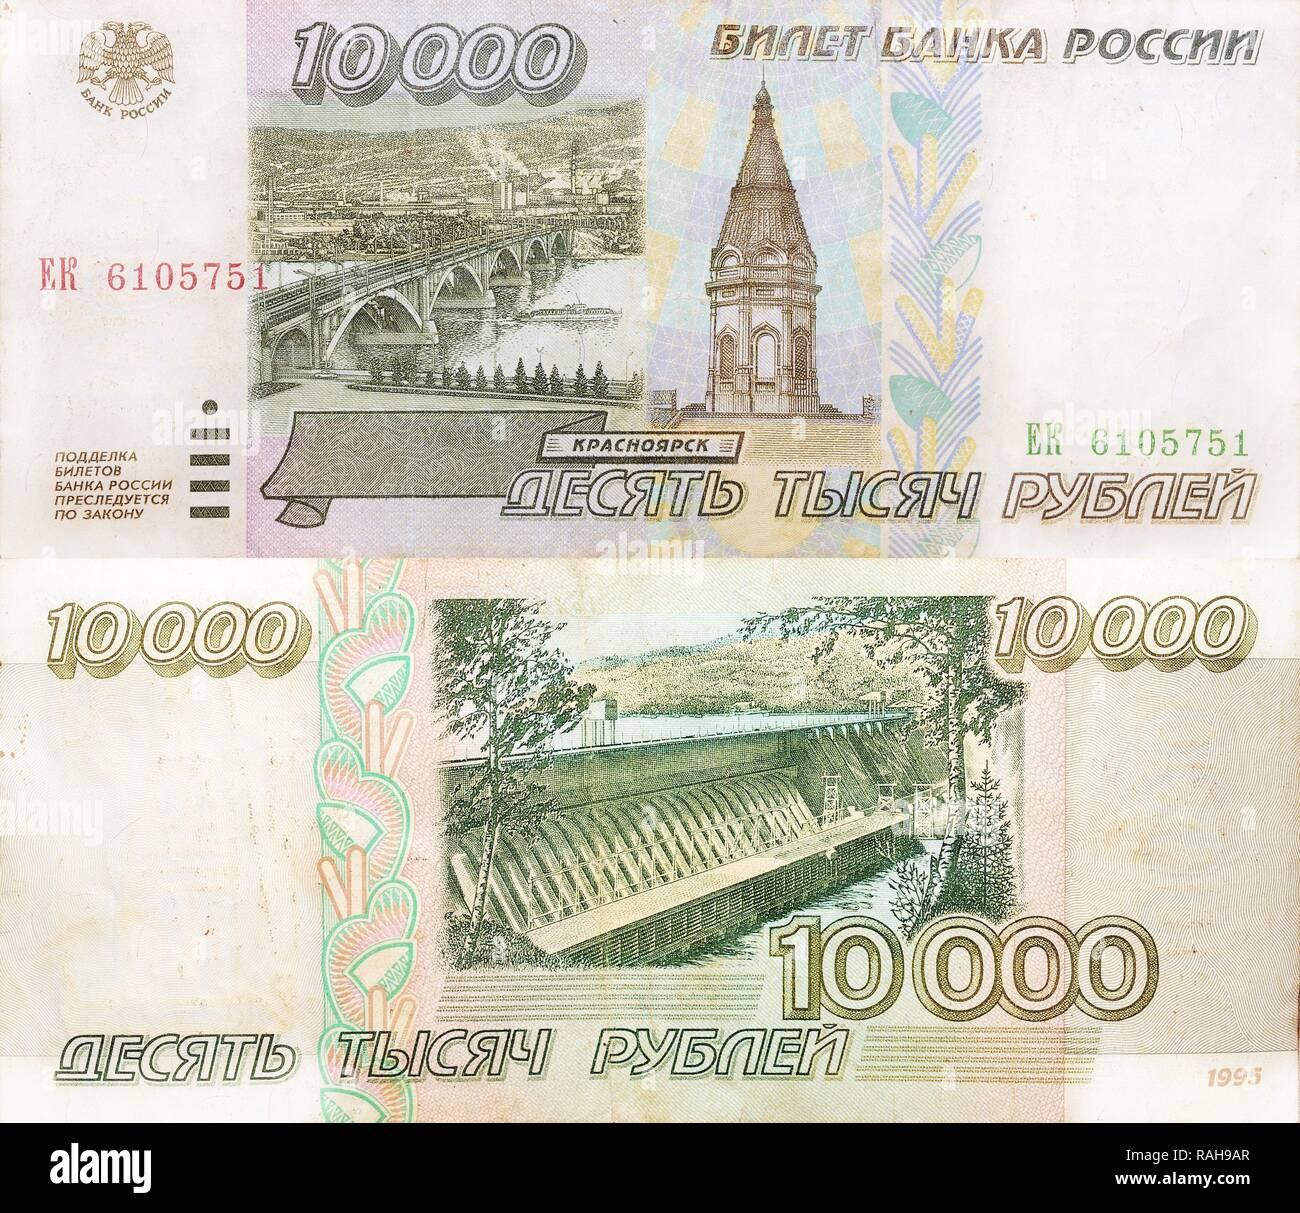 Historic banknote, 10000 Russian rubles, 1995 Stock Photo